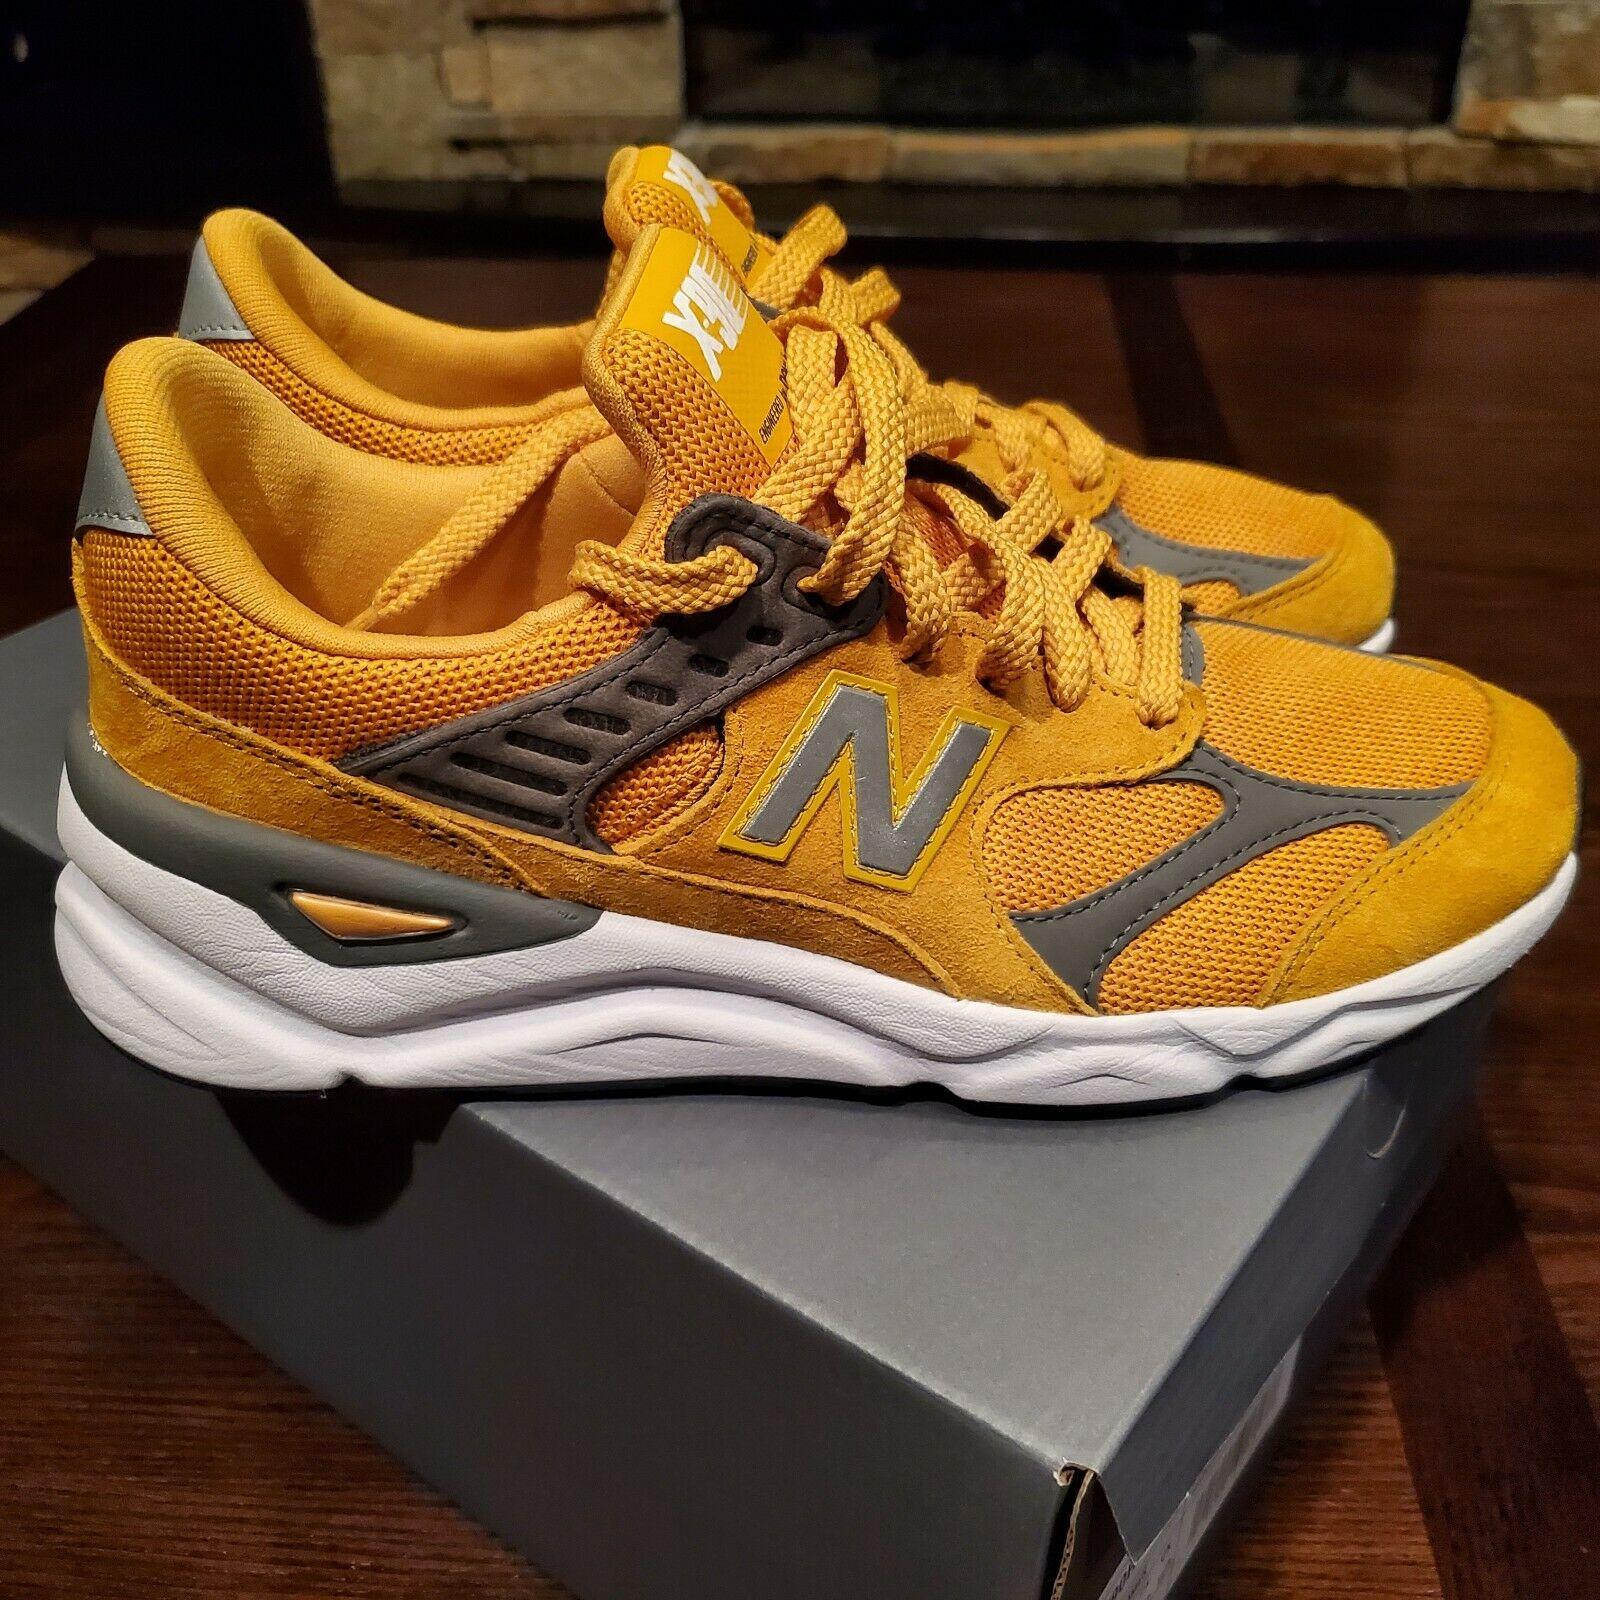 New Balance X 90 Mustard Yellow